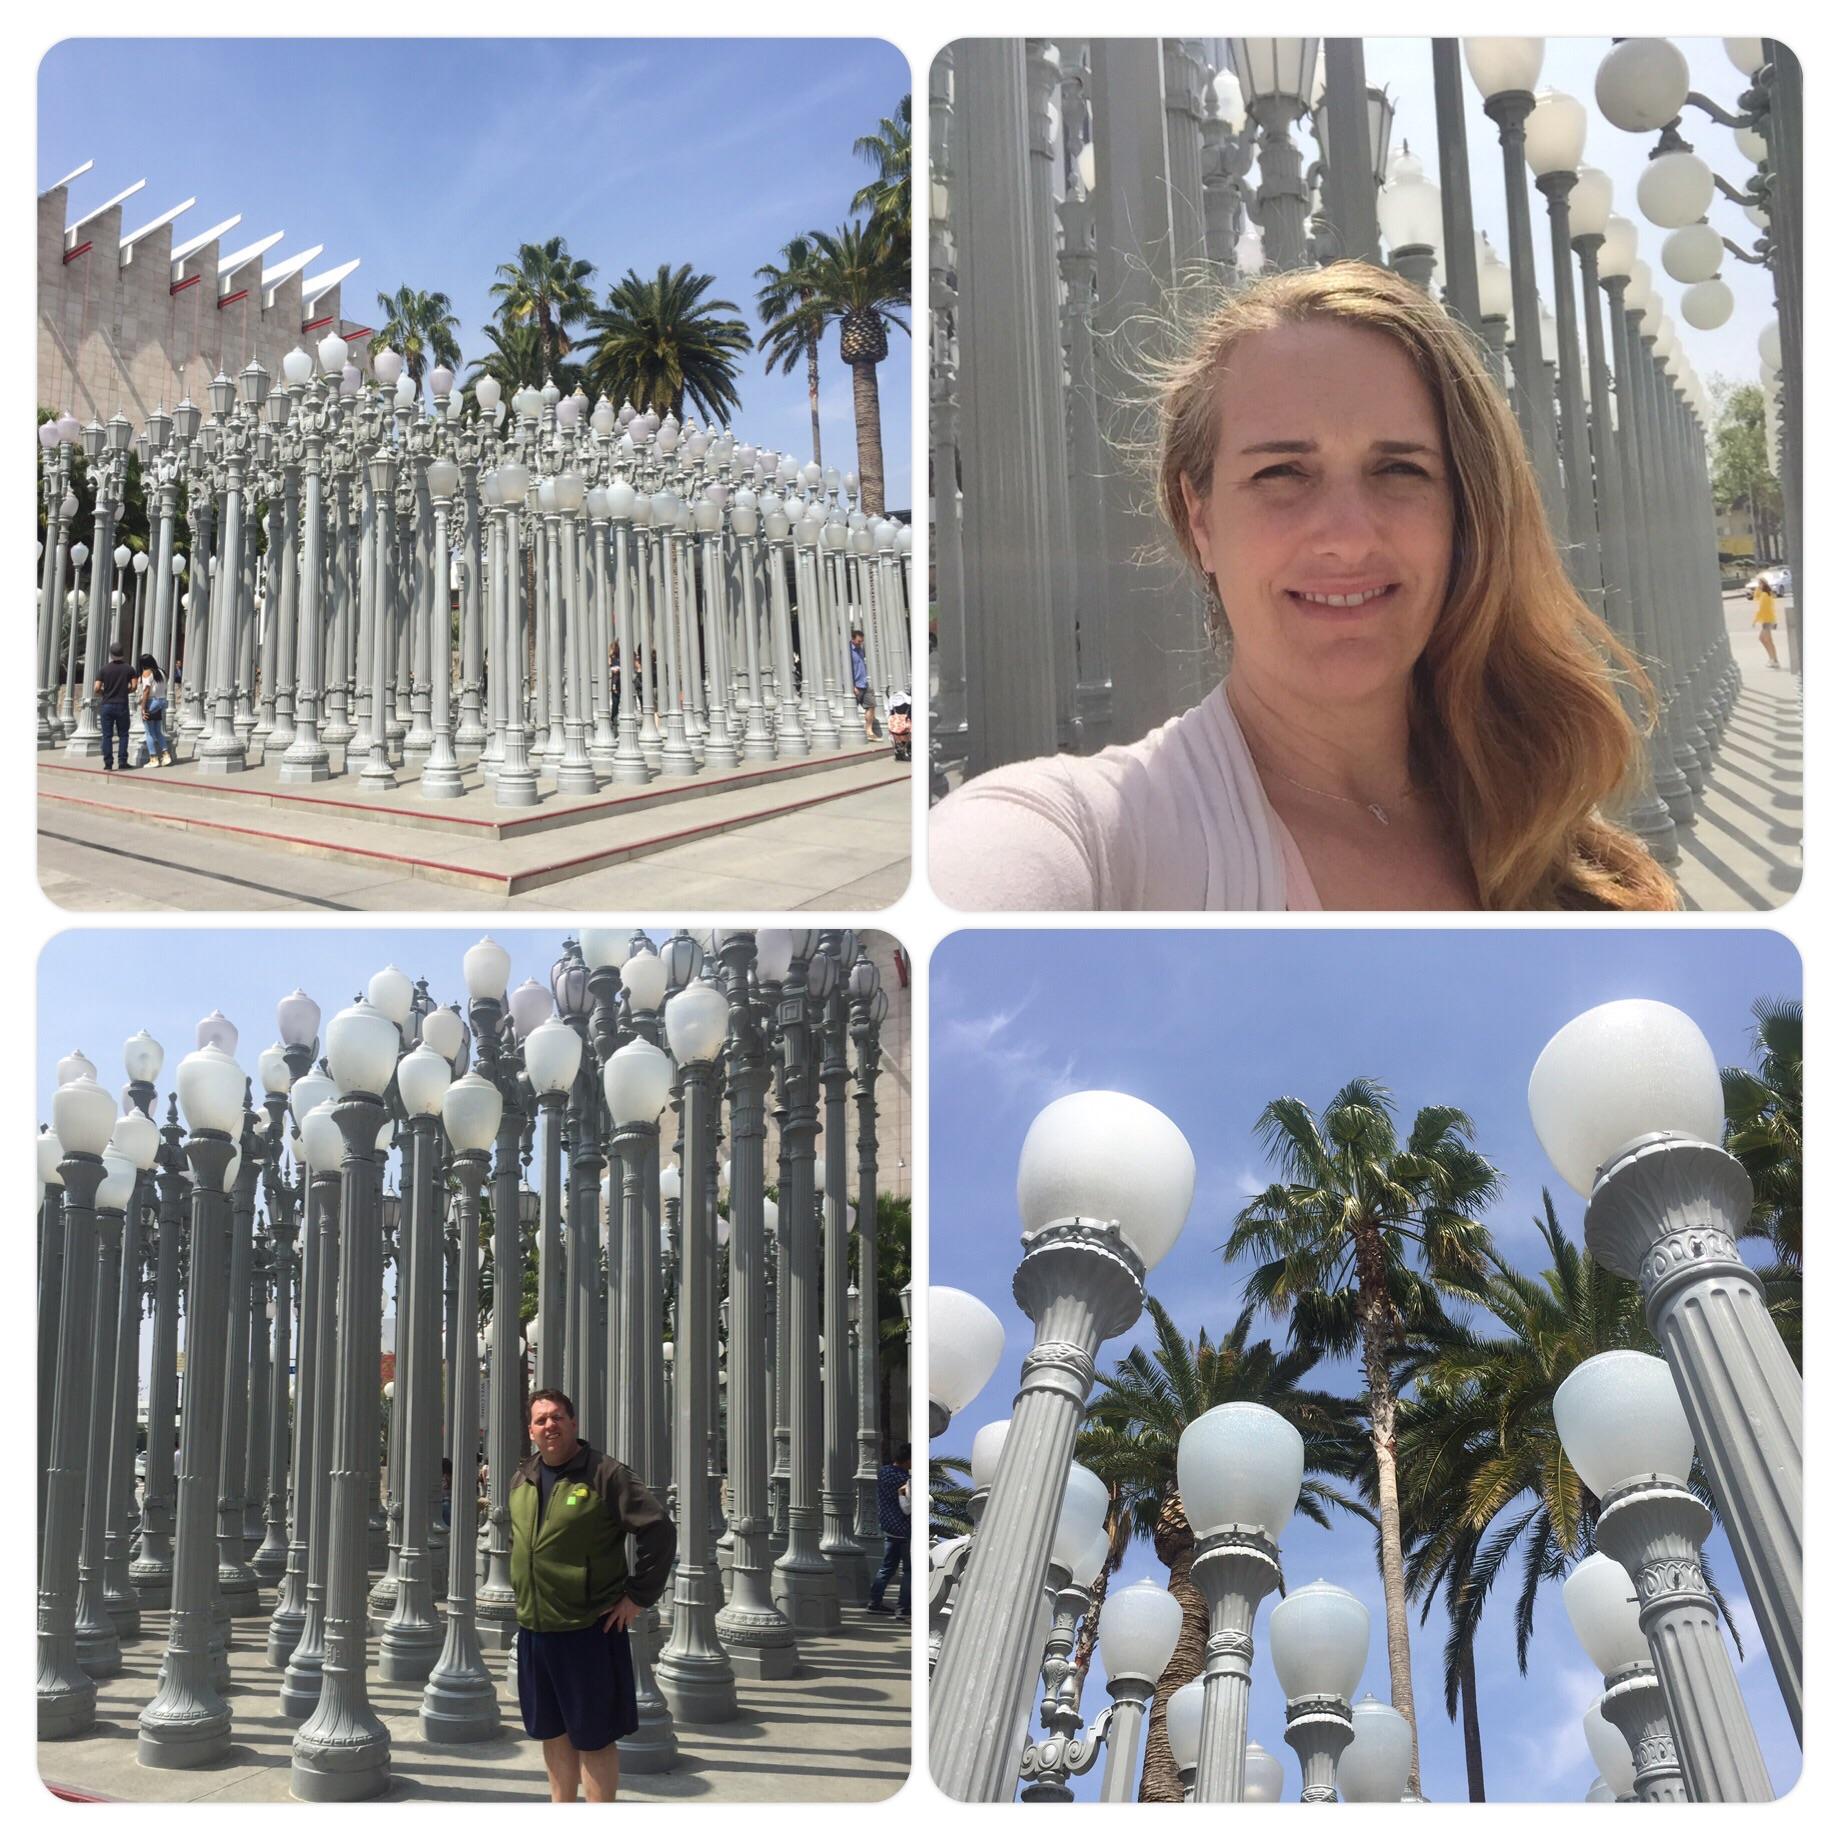 Urban Lights - Los Angeles County Museum of Art